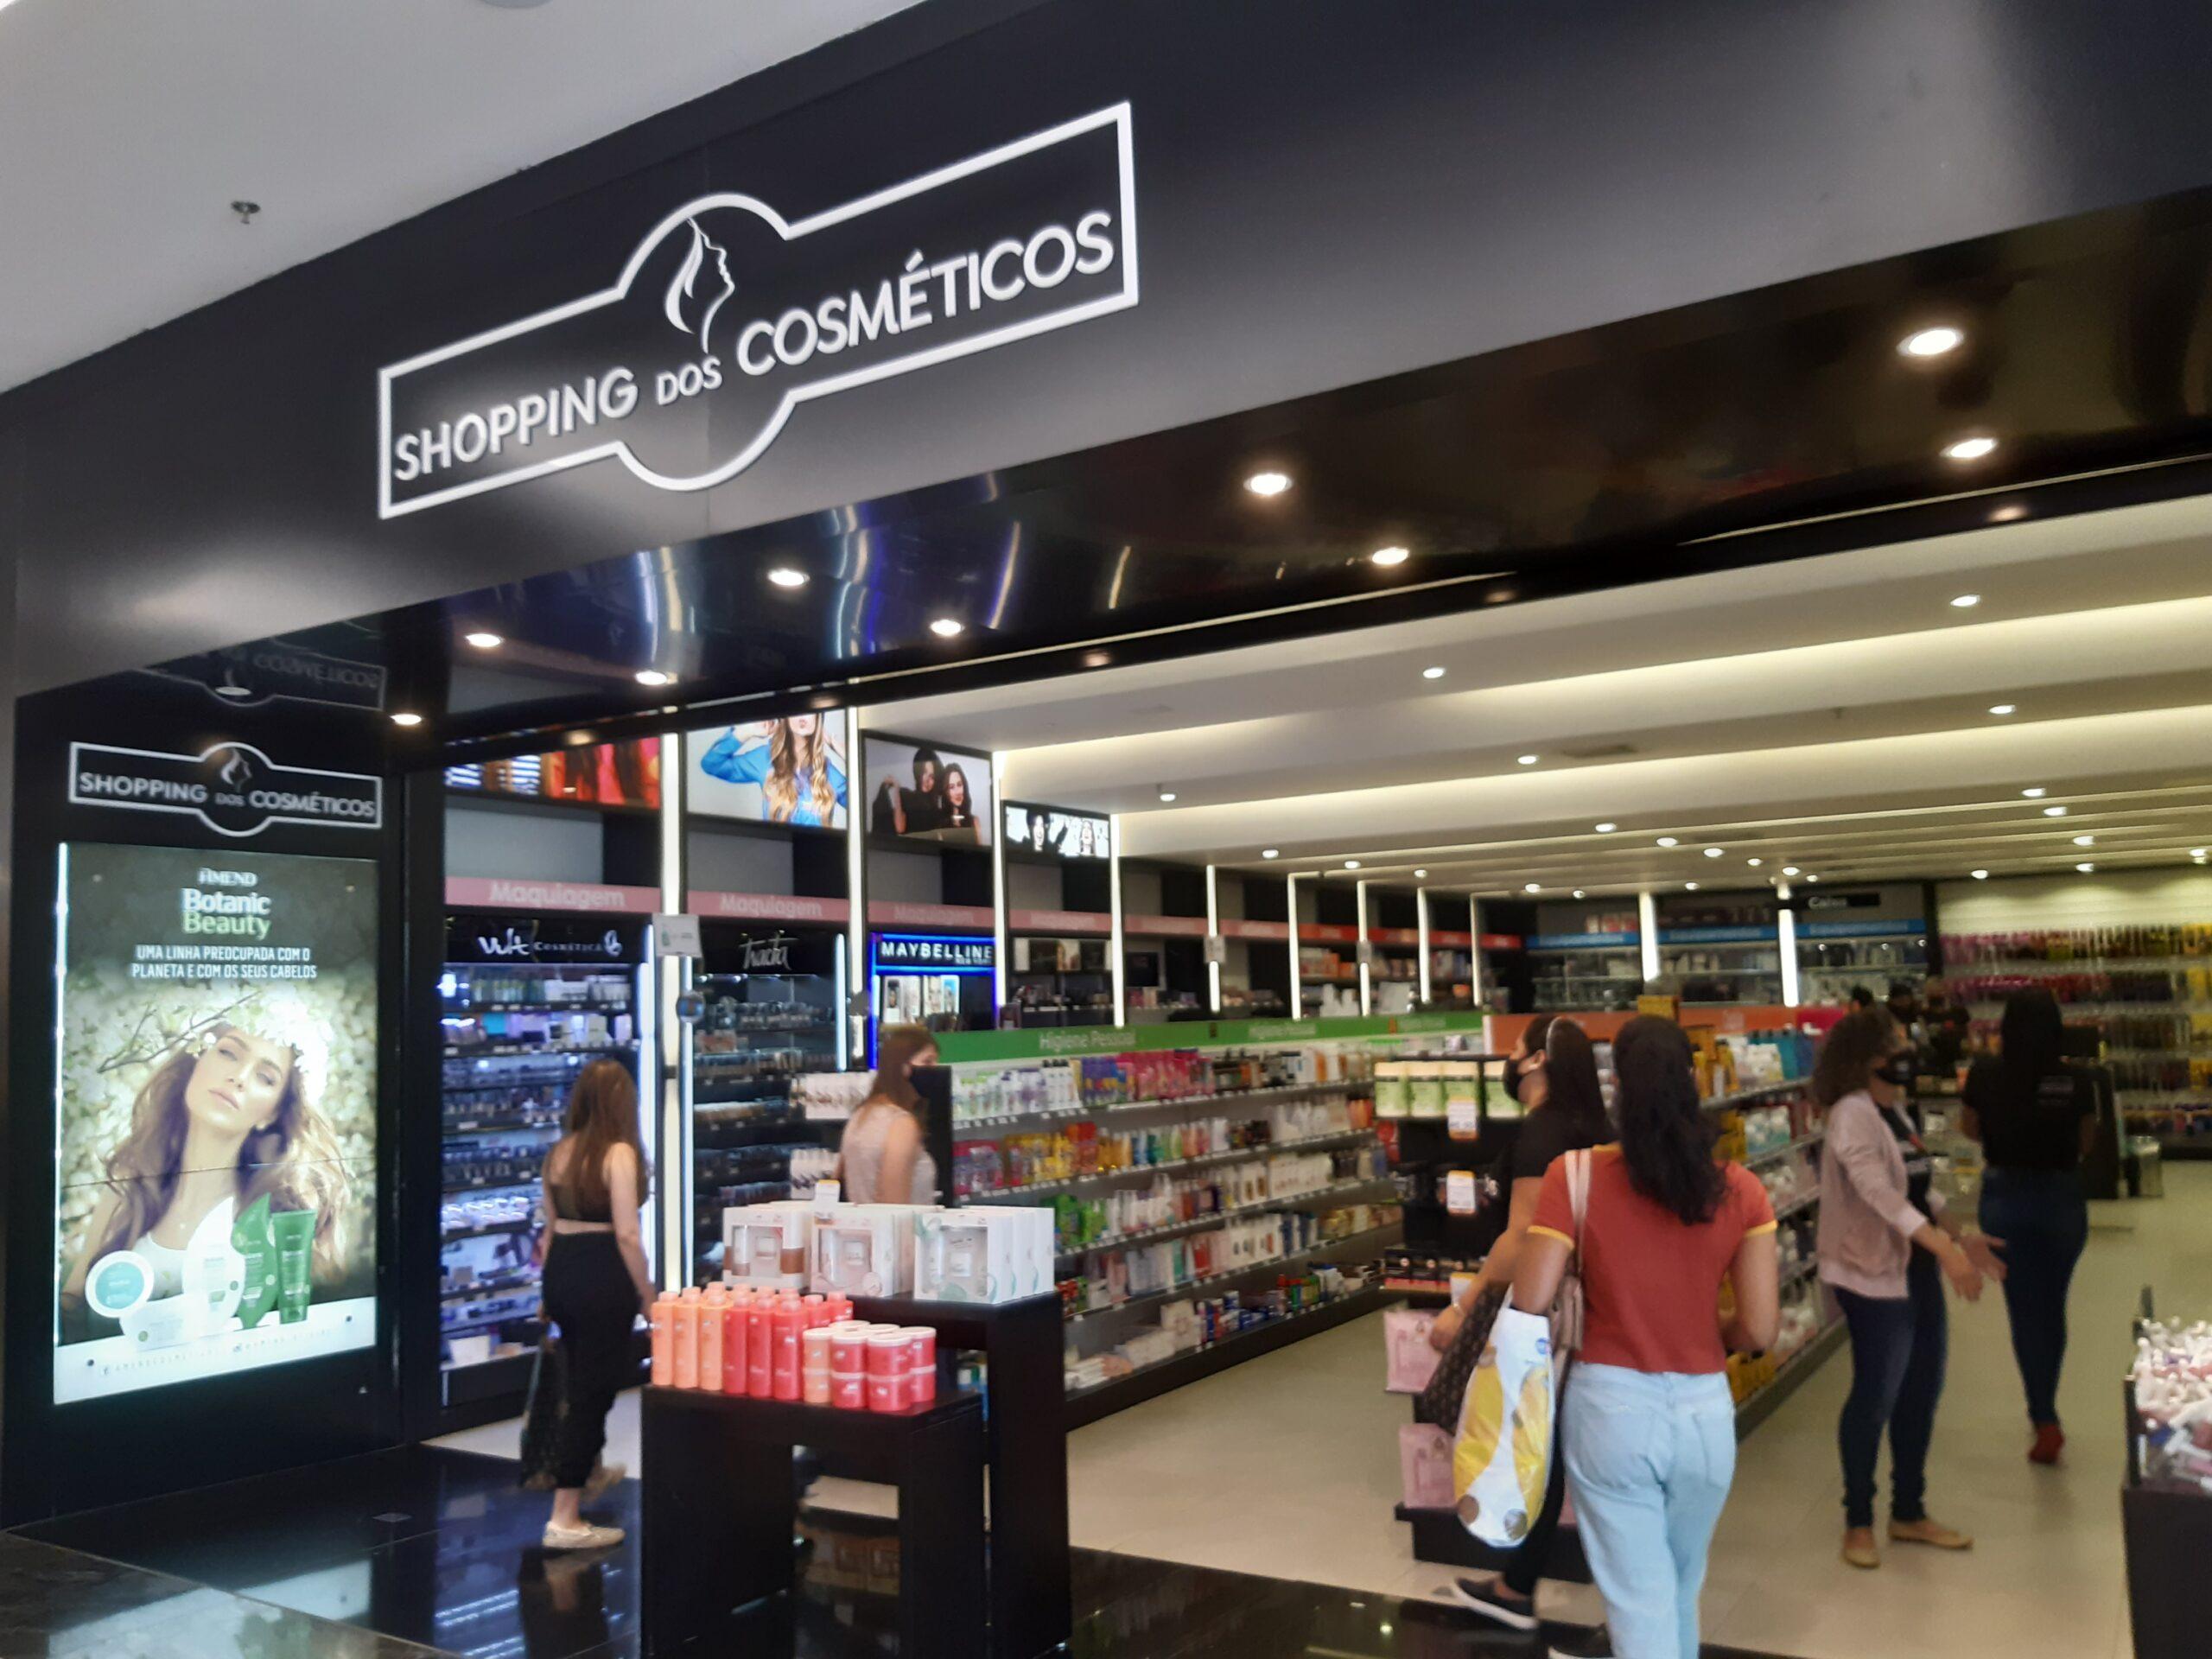 Shopping dos Cosméticos do Taguatinga Shopping, Comércio Brasilia